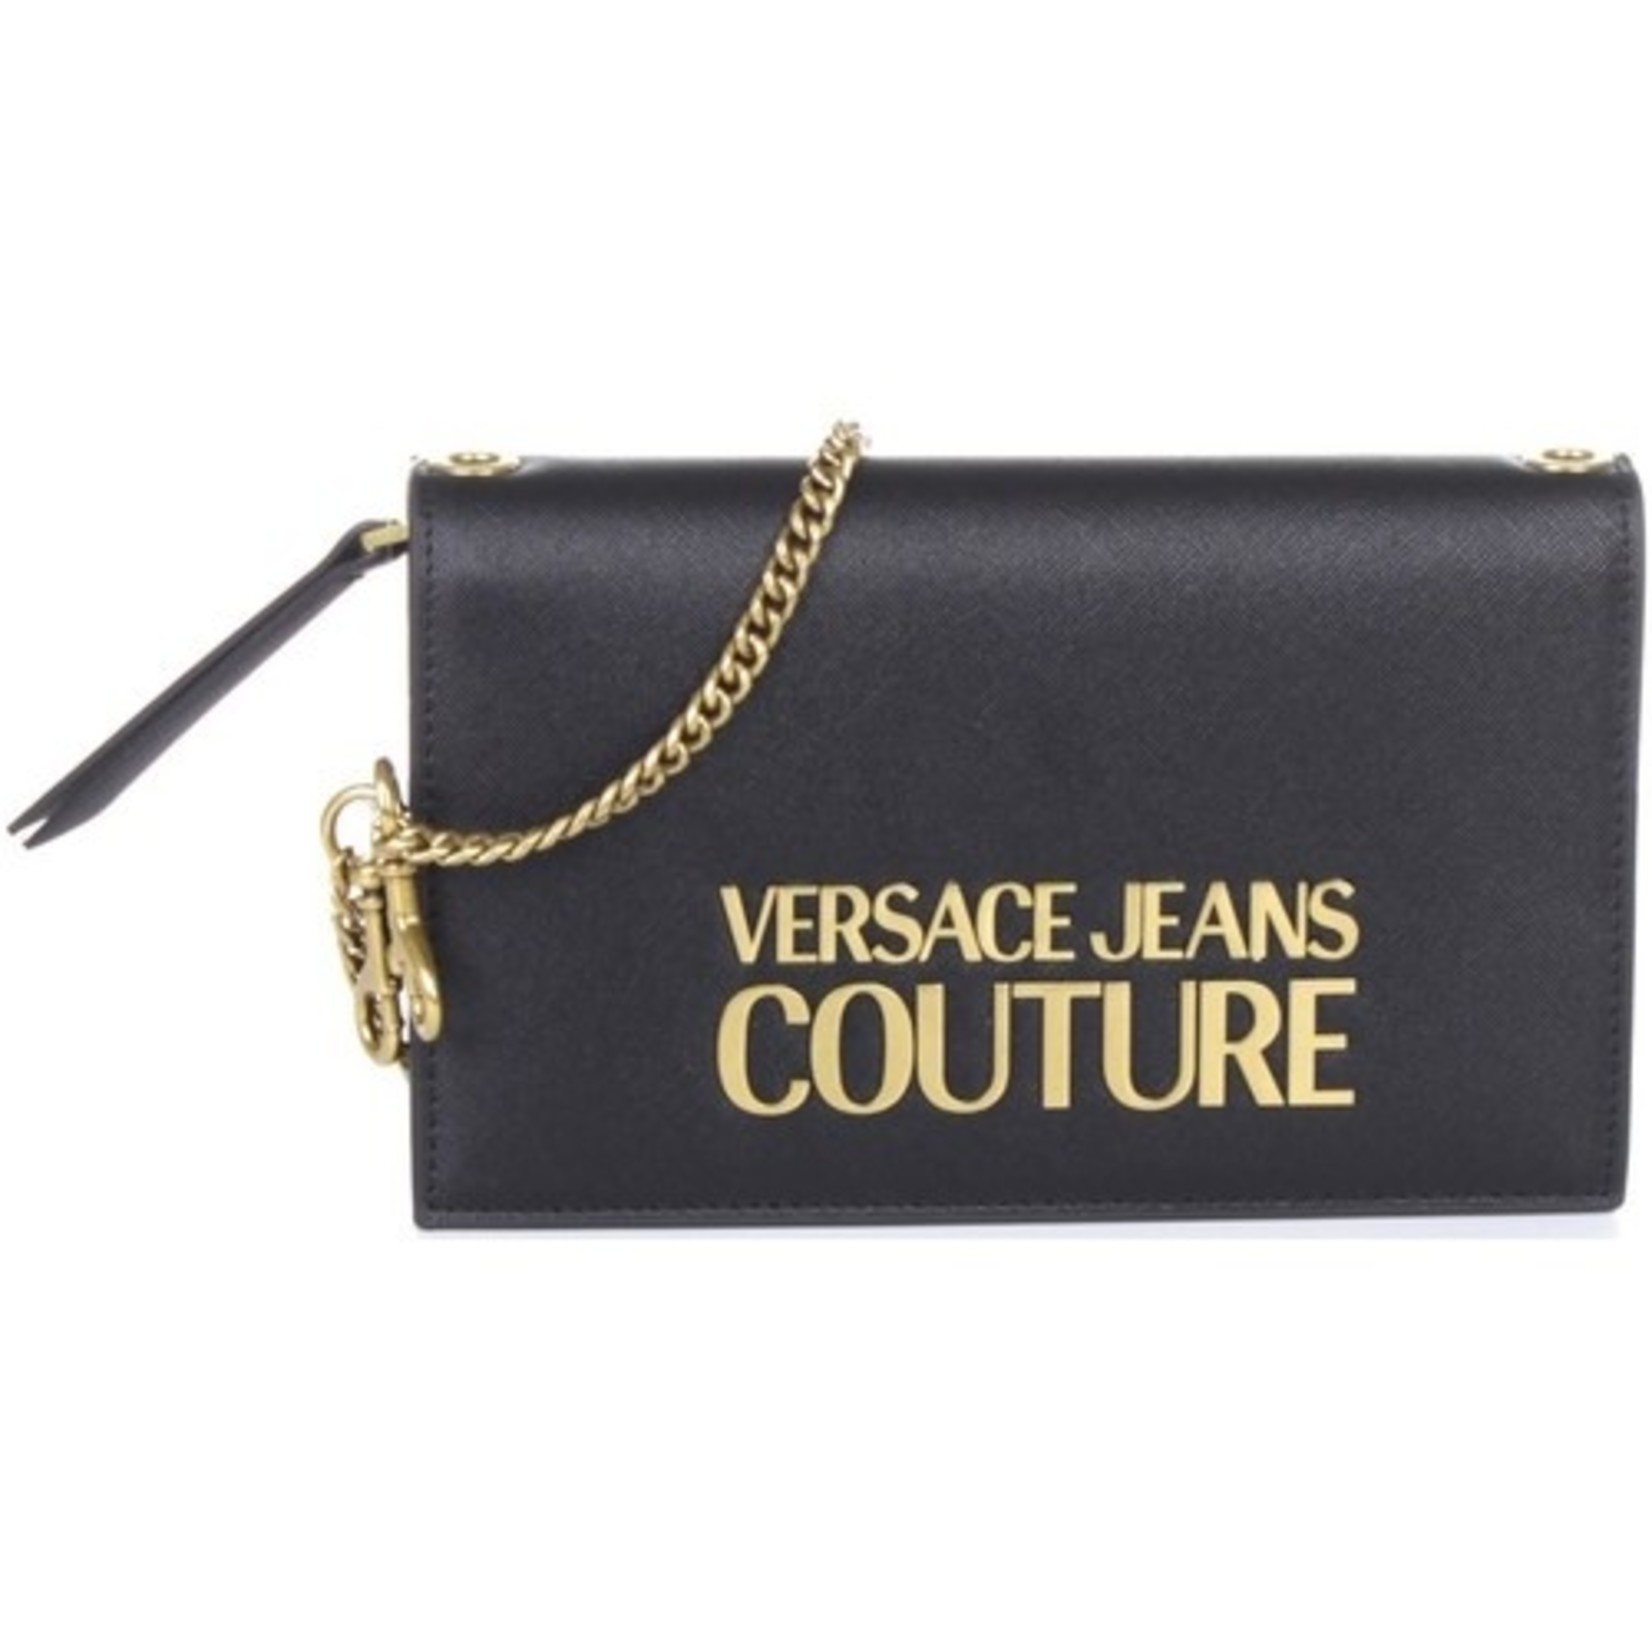 VERSACE JEANS COUTURE VERSACE JEANS COUTURE WOMEN'S BAG RANGE L LOGO LOCK - 71VA5PL6